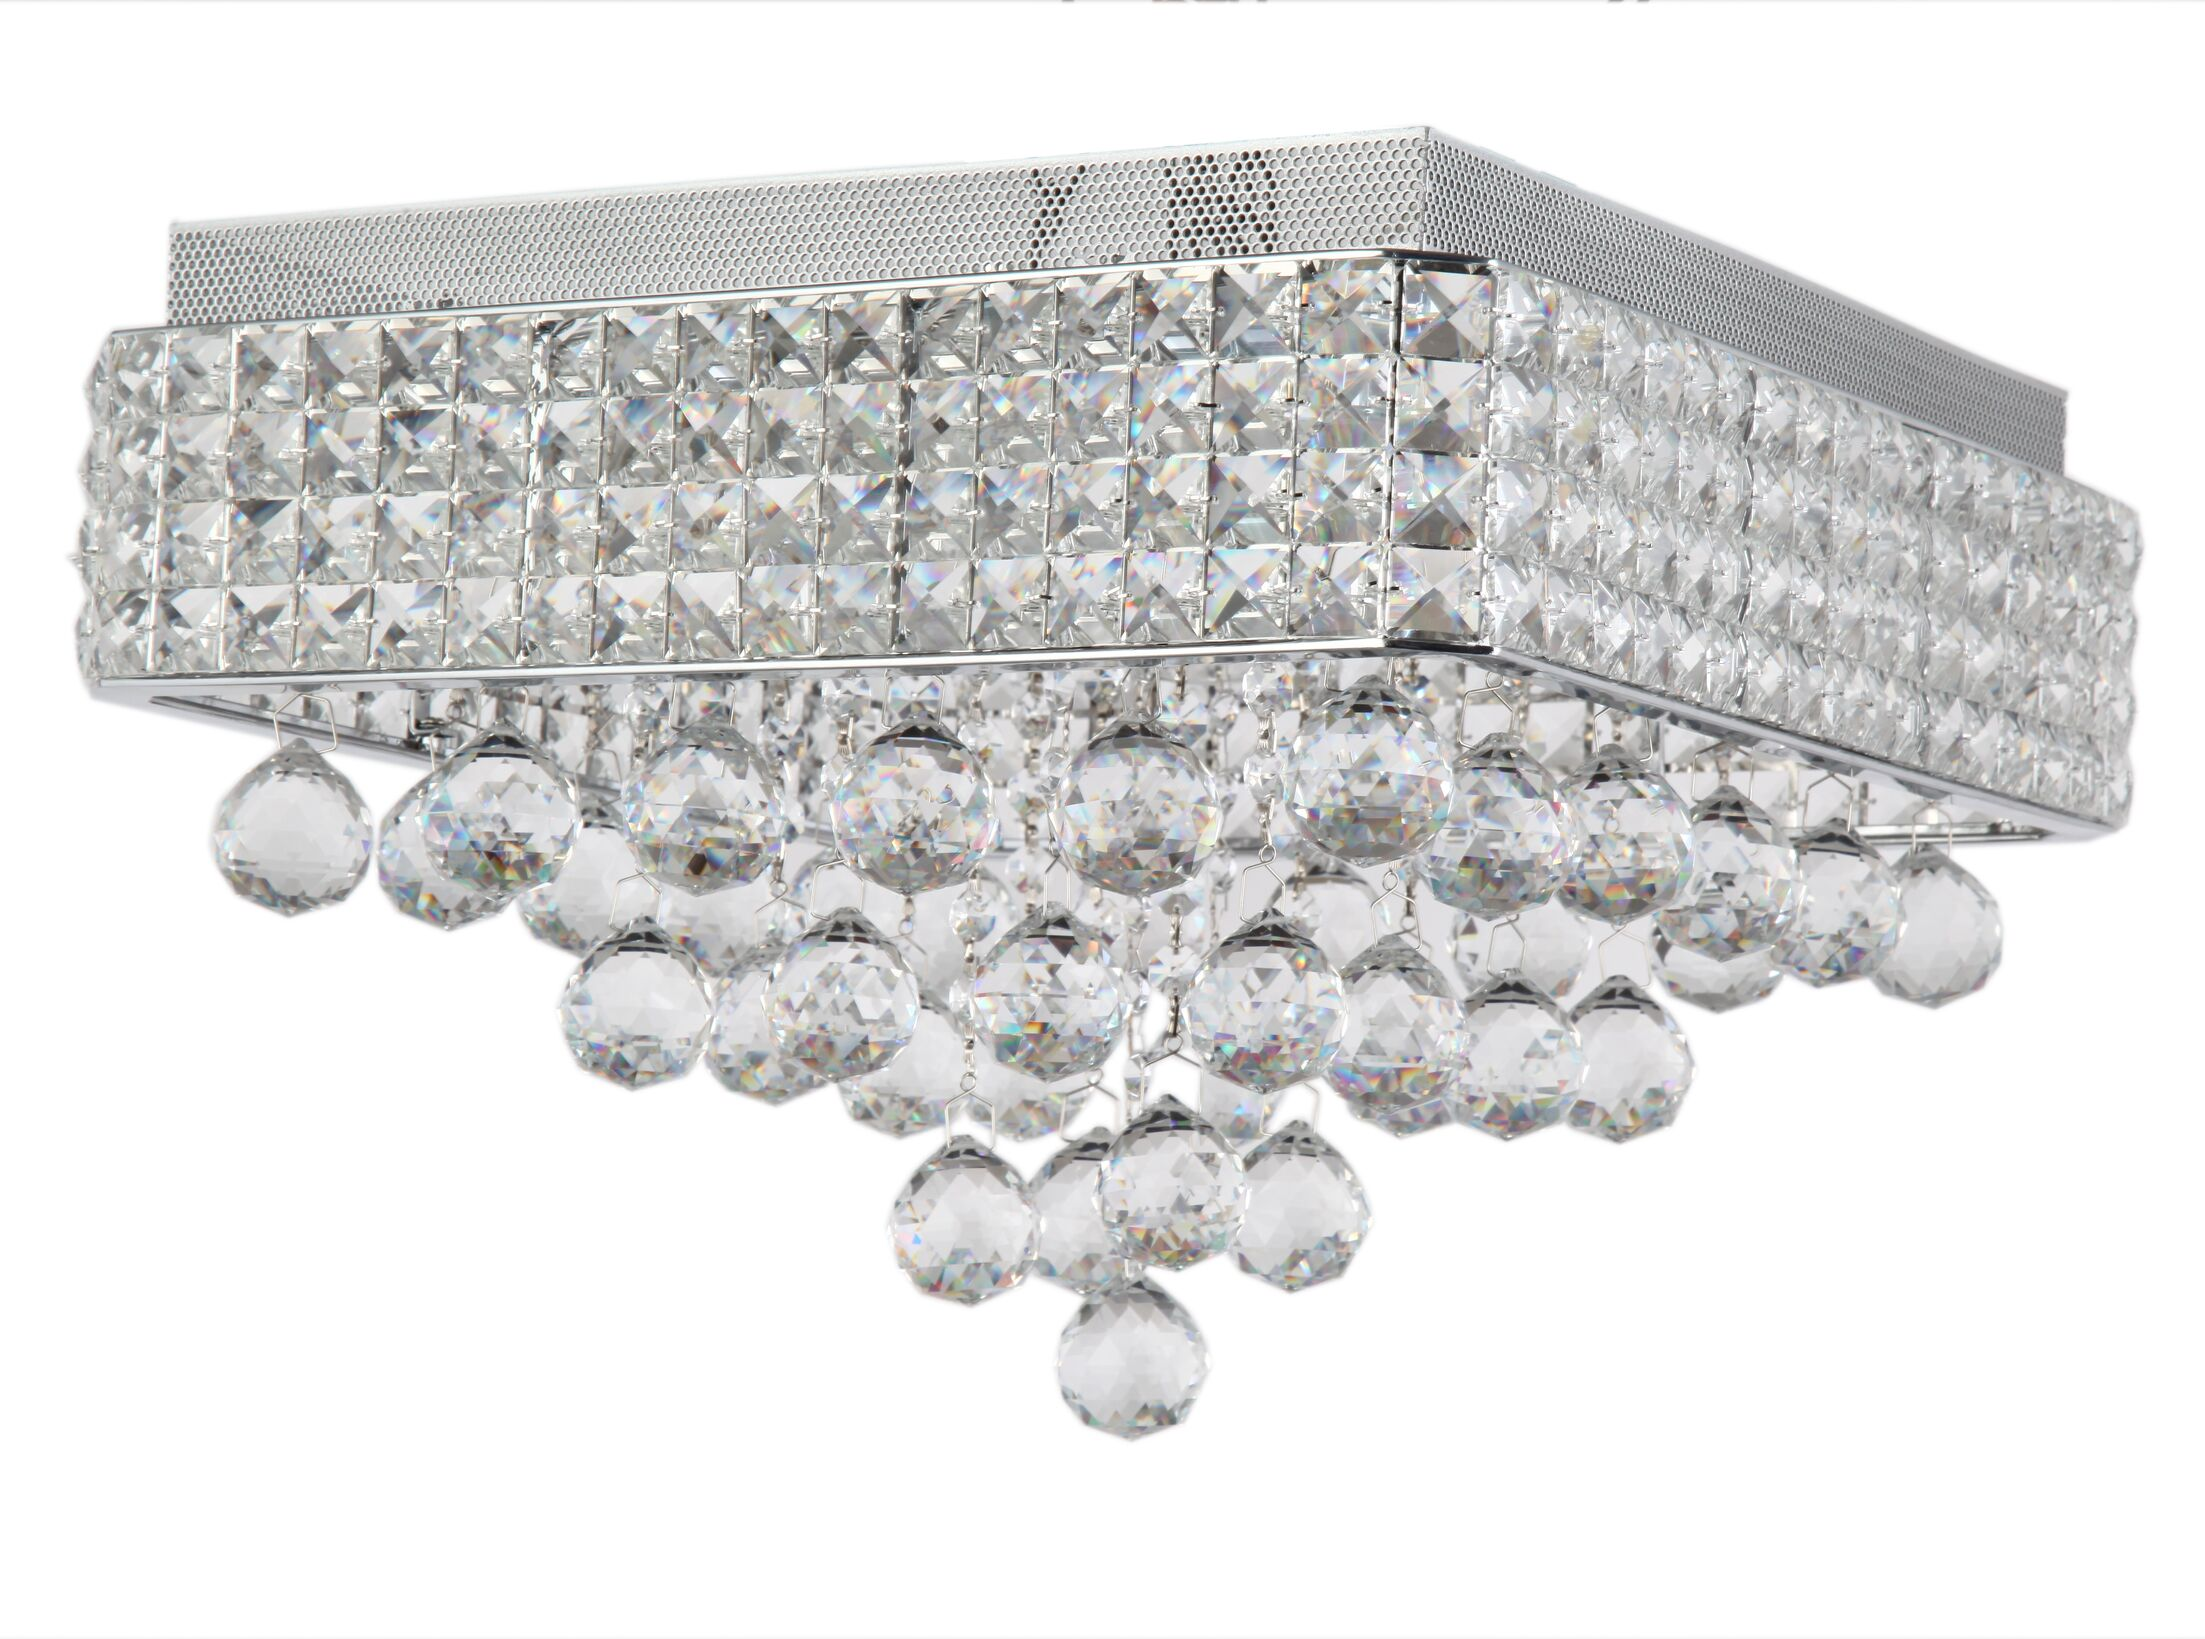 Ahlstrom 6-Light Crystal Shade Flush Mount